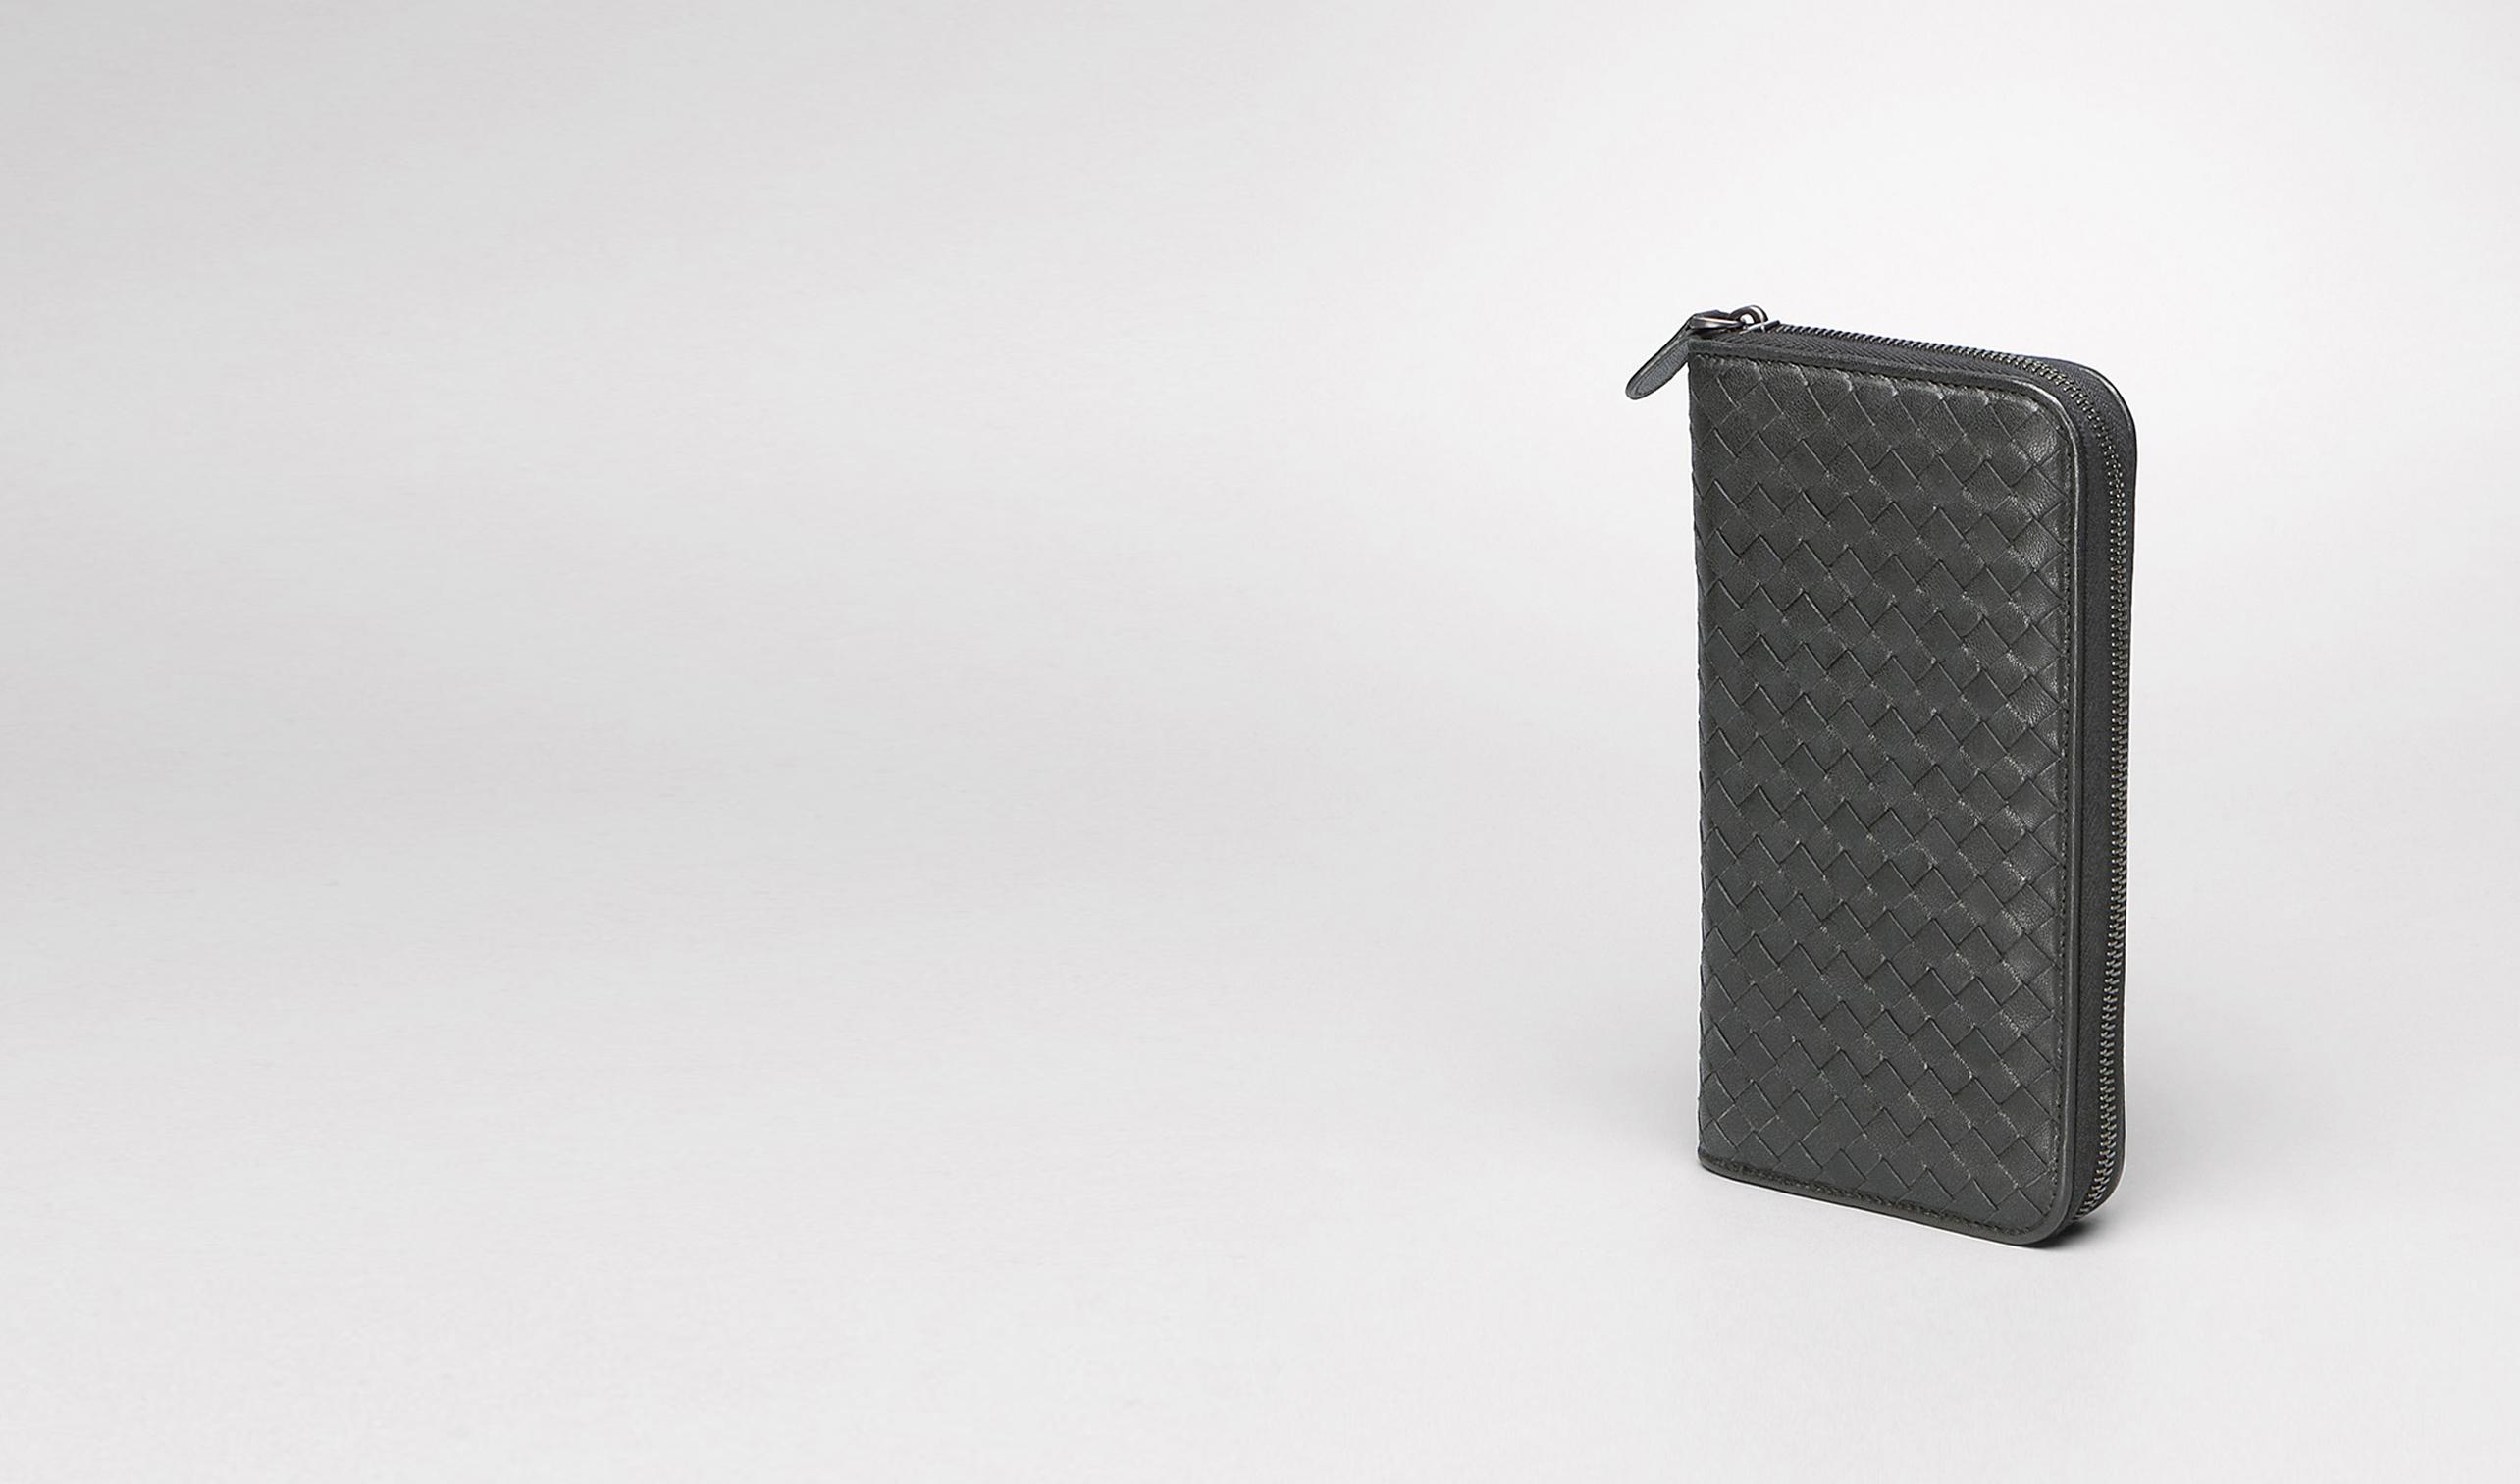 BOTTEGA VENETA Portemonnaie mit Zip E Dokumententasche aus gewaschenem Lammleder Ardoise pl